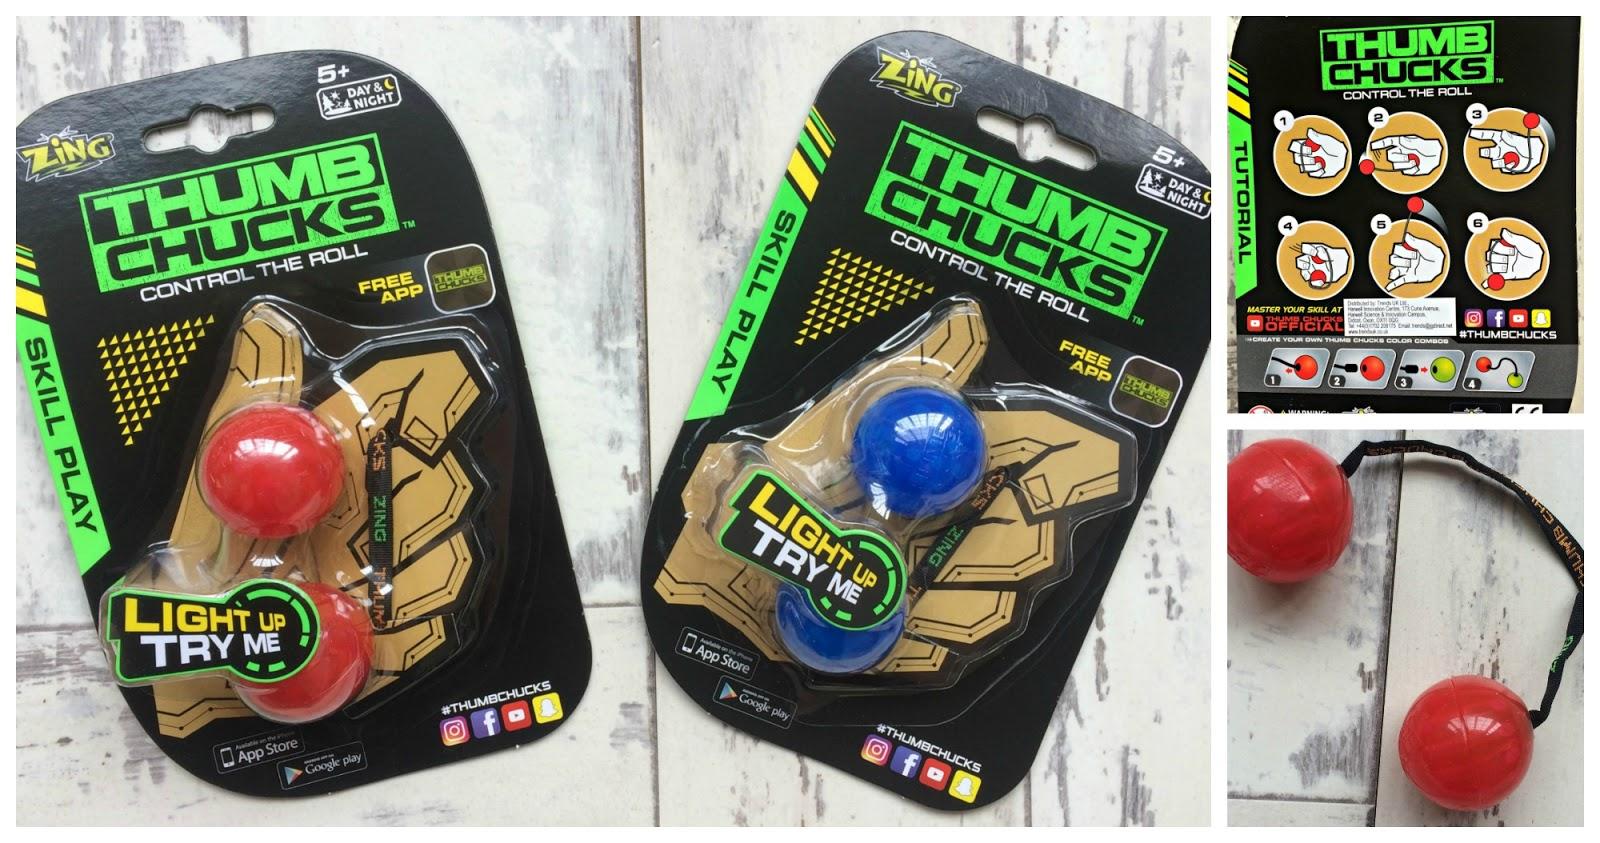 Fidget Toys #thumbchucks #fidgetspinners